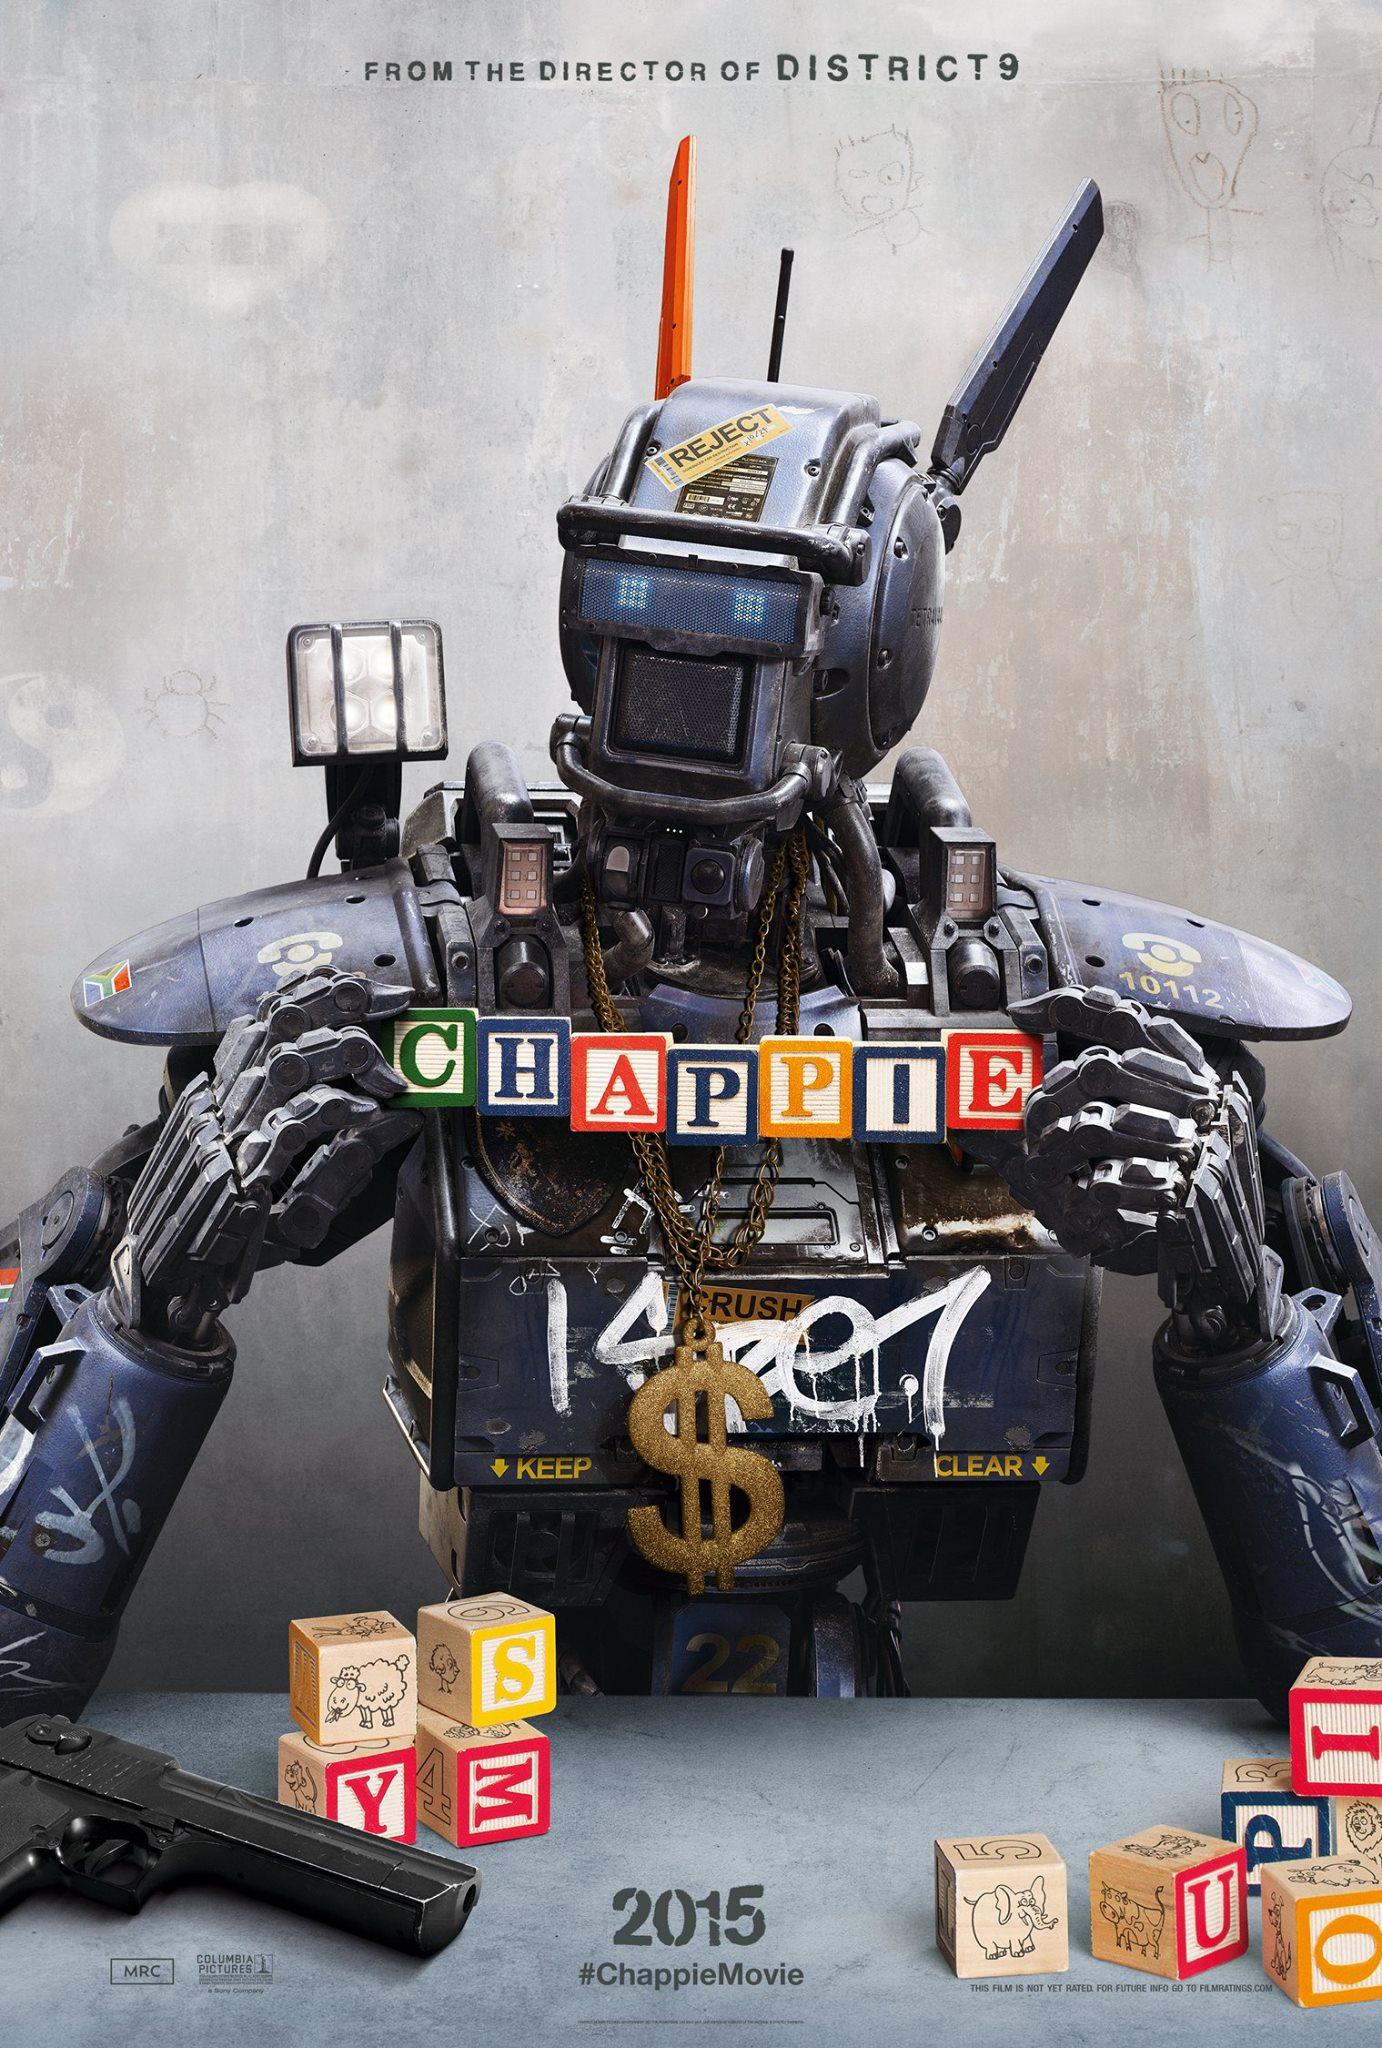 Chappie-Movie-Poster